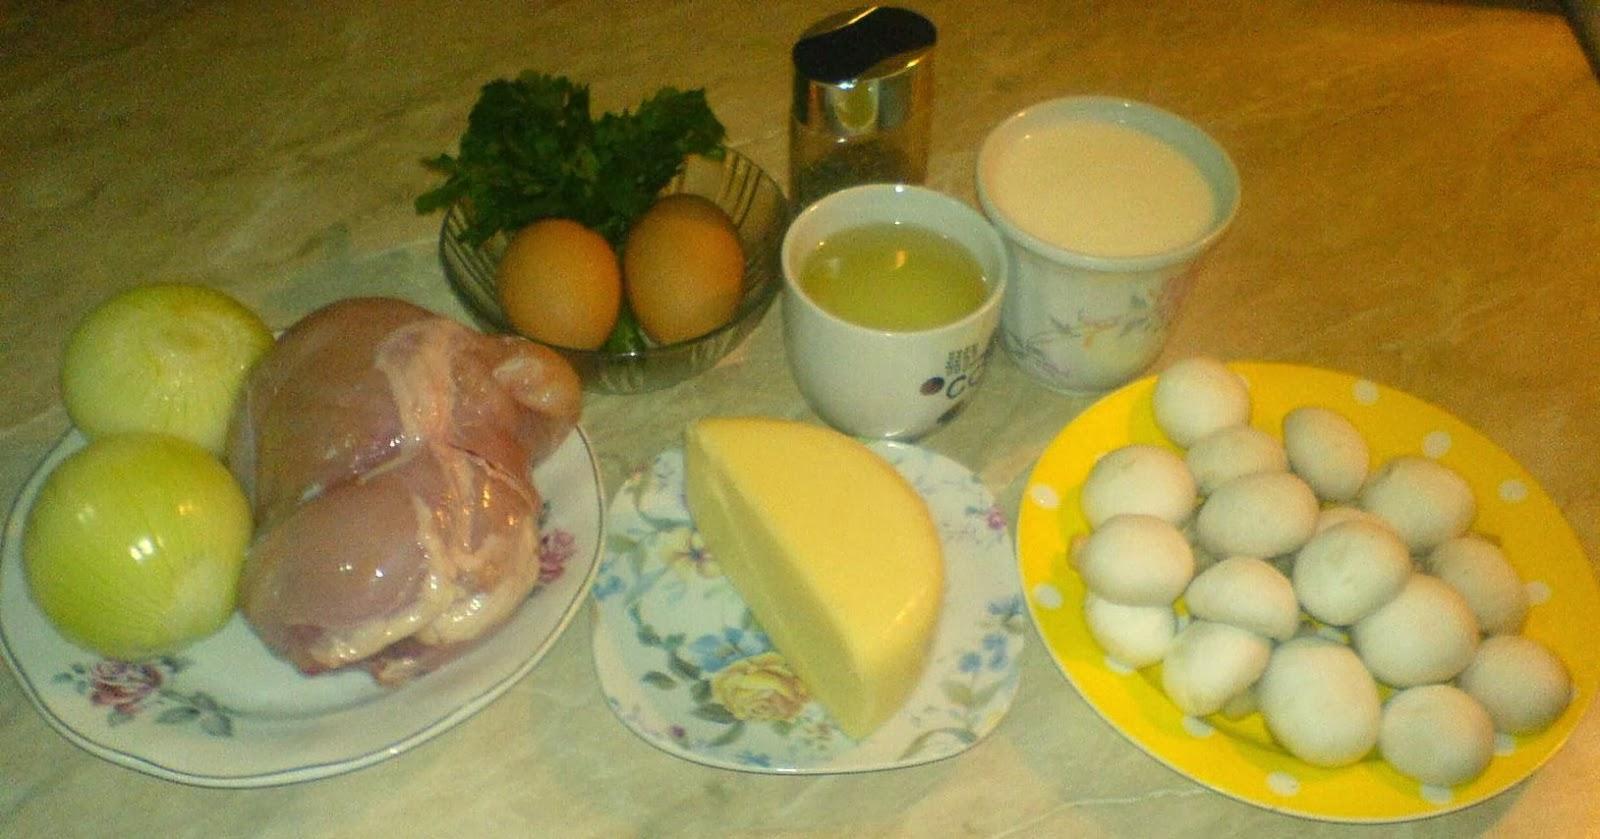 retete culinare, retete cu ciuperci, retete de mancare, clatite la cuptor